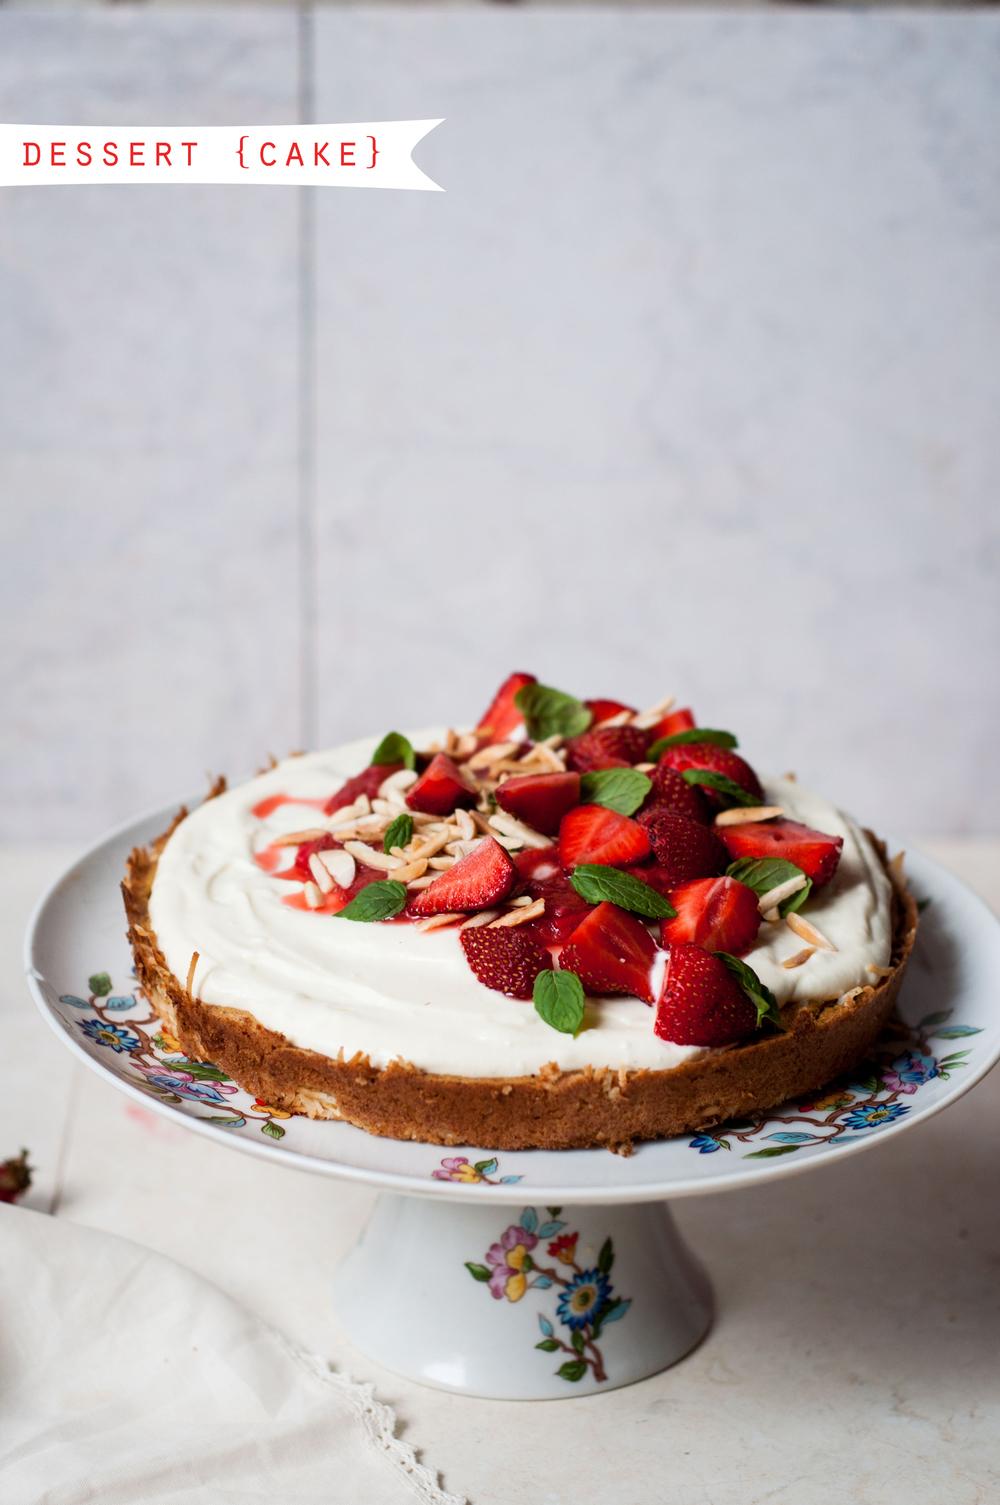 RHUBARB STRAWBERRY CAKE WITH OAT-ALMOND-COCONUT SPONGE